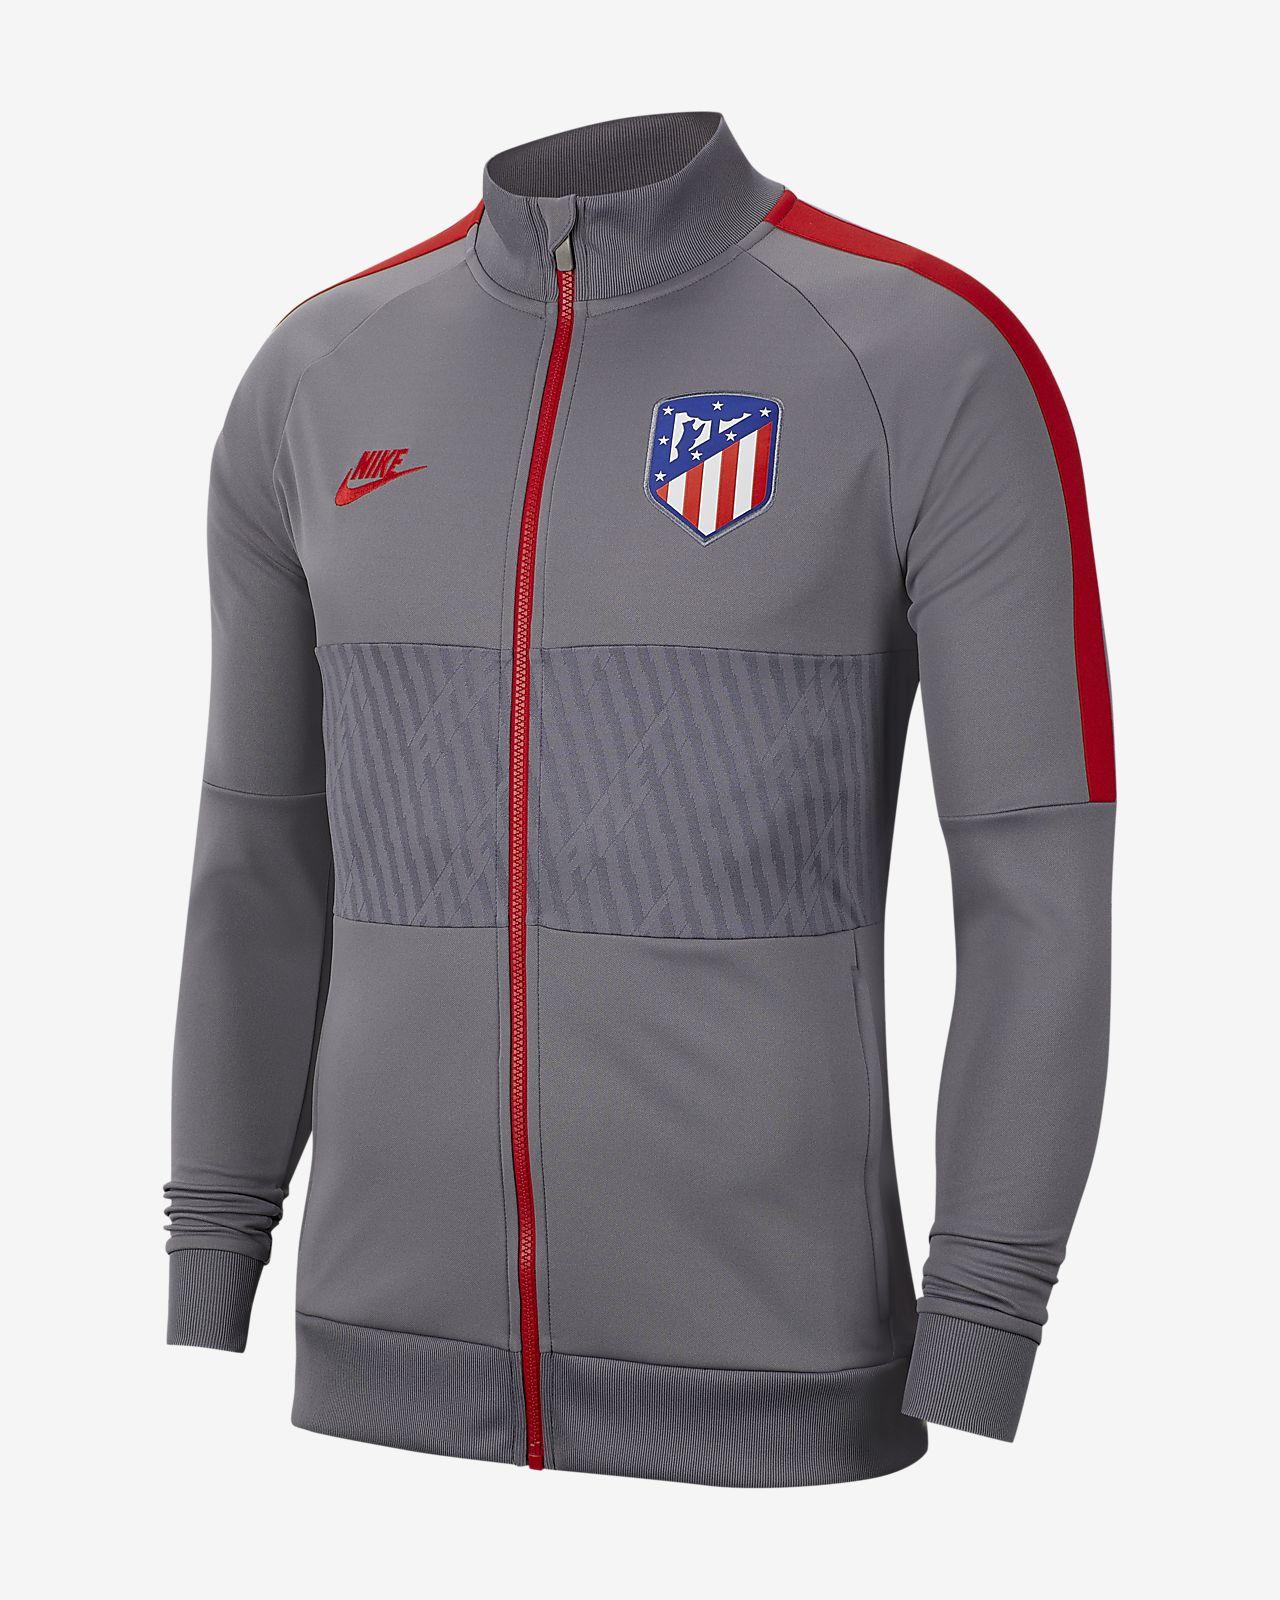 Chamarra para hombre del Atlético de Madrid